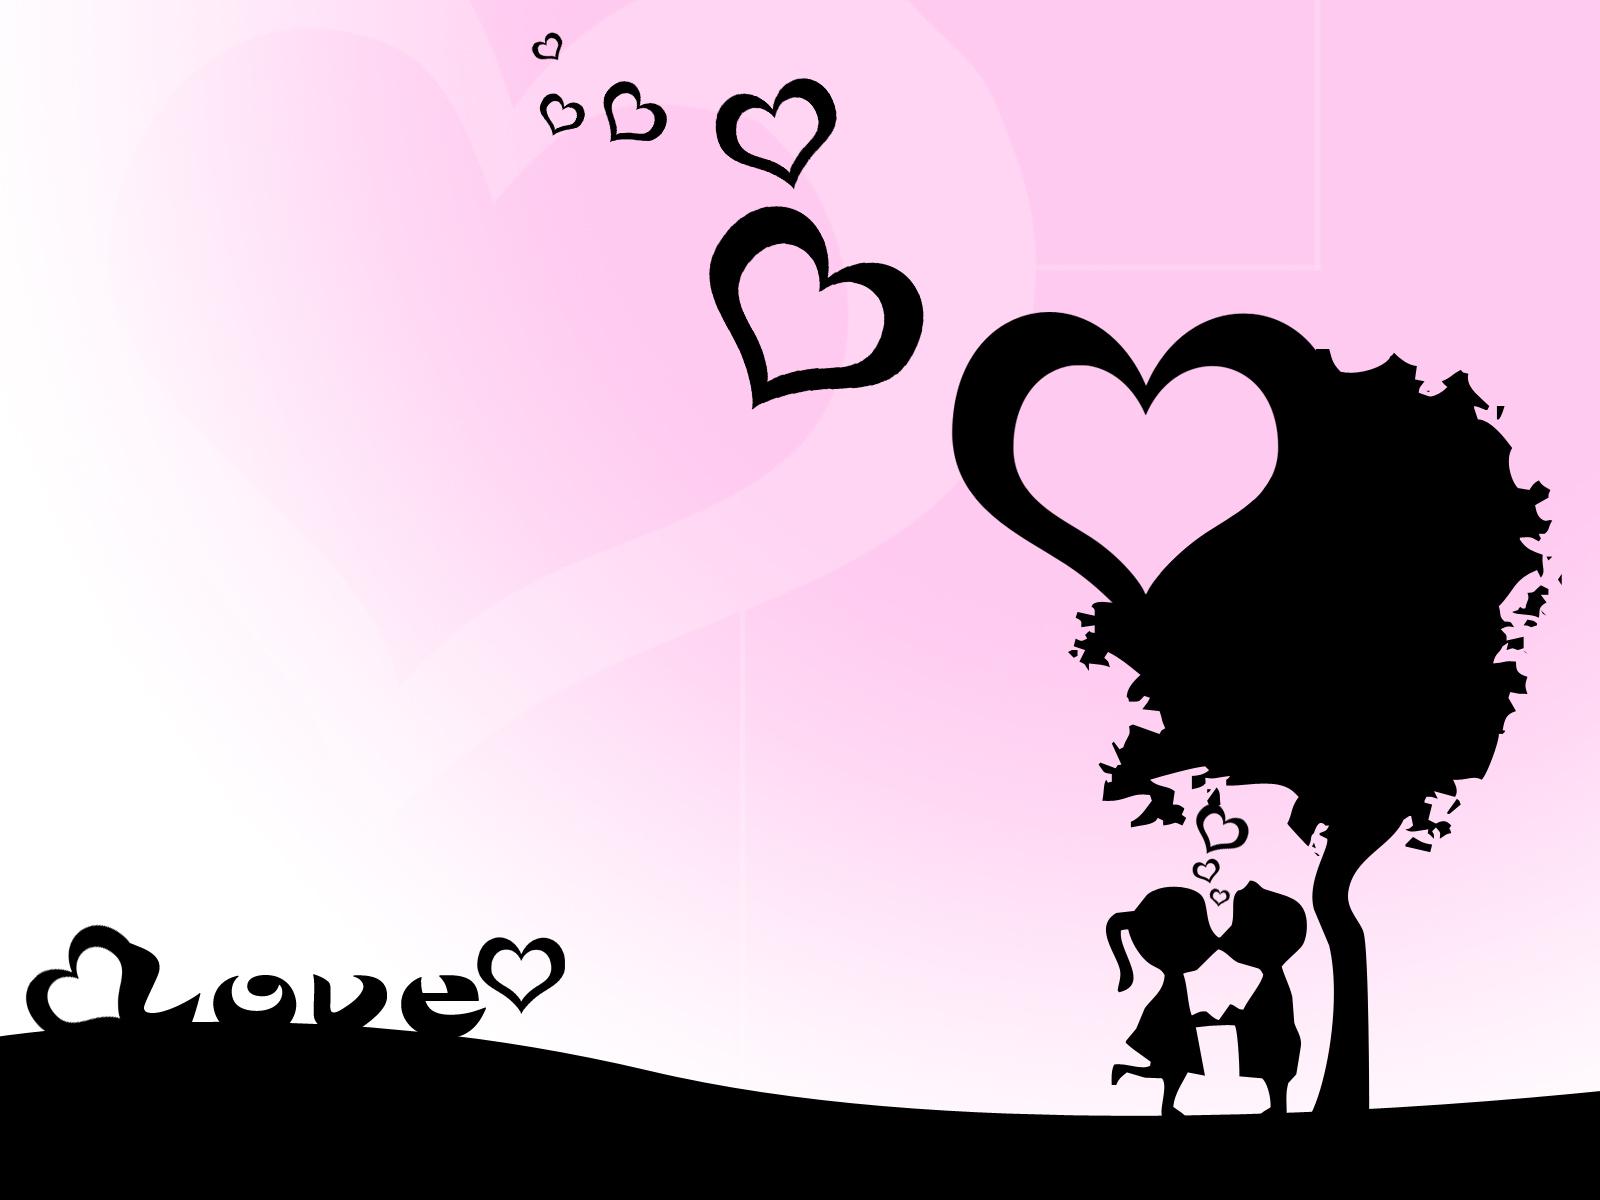 Cute Love HD Desktop Wallpapers High Quality WallpapersWallpaper 1600x1200